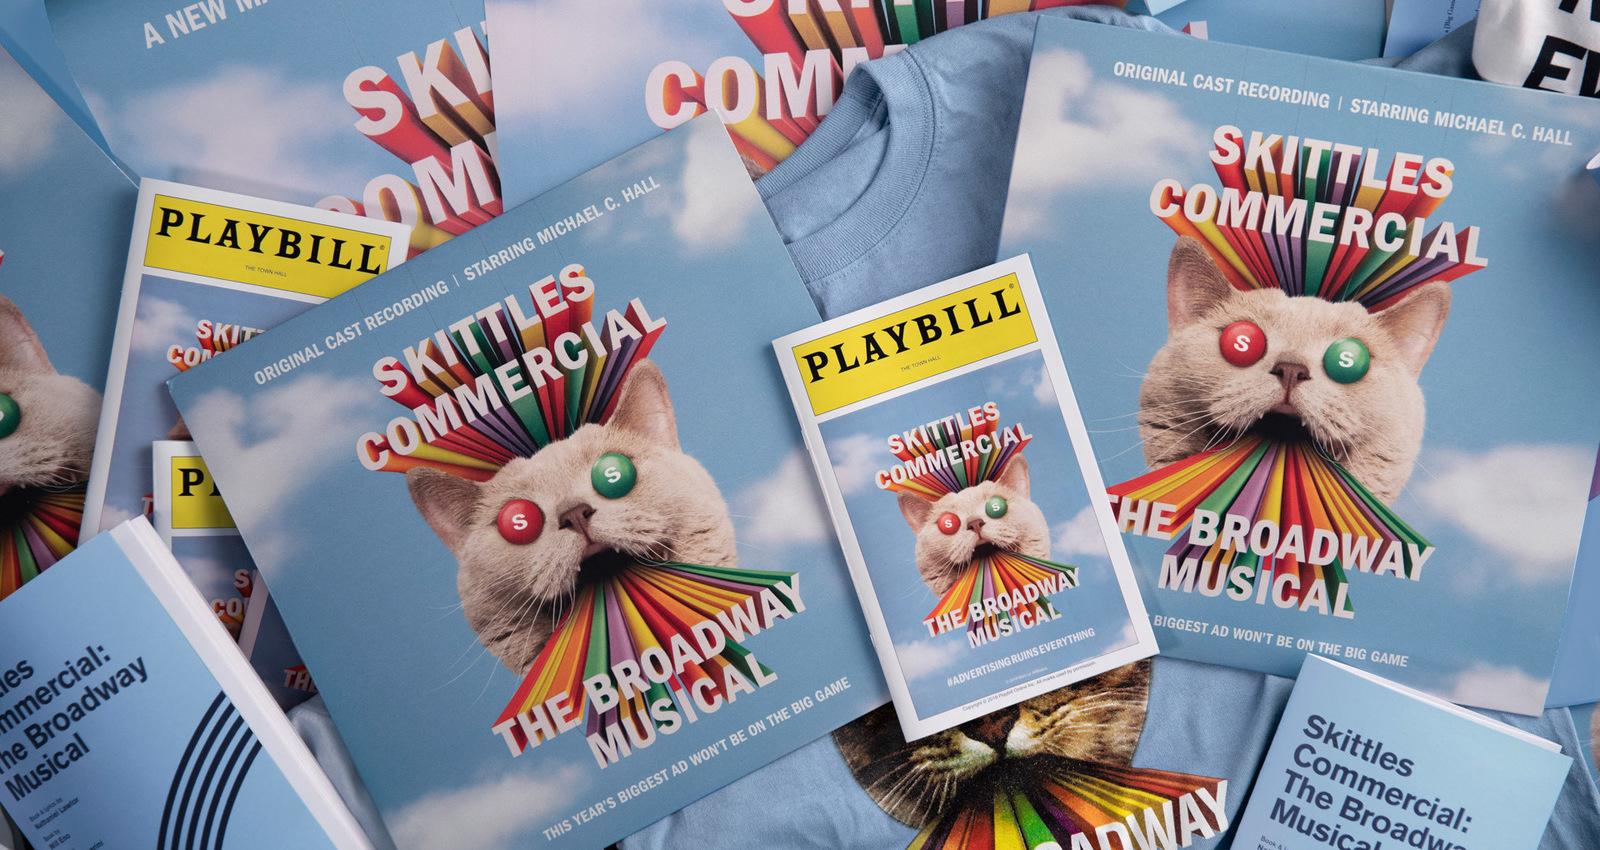 Broadway the Rainbow